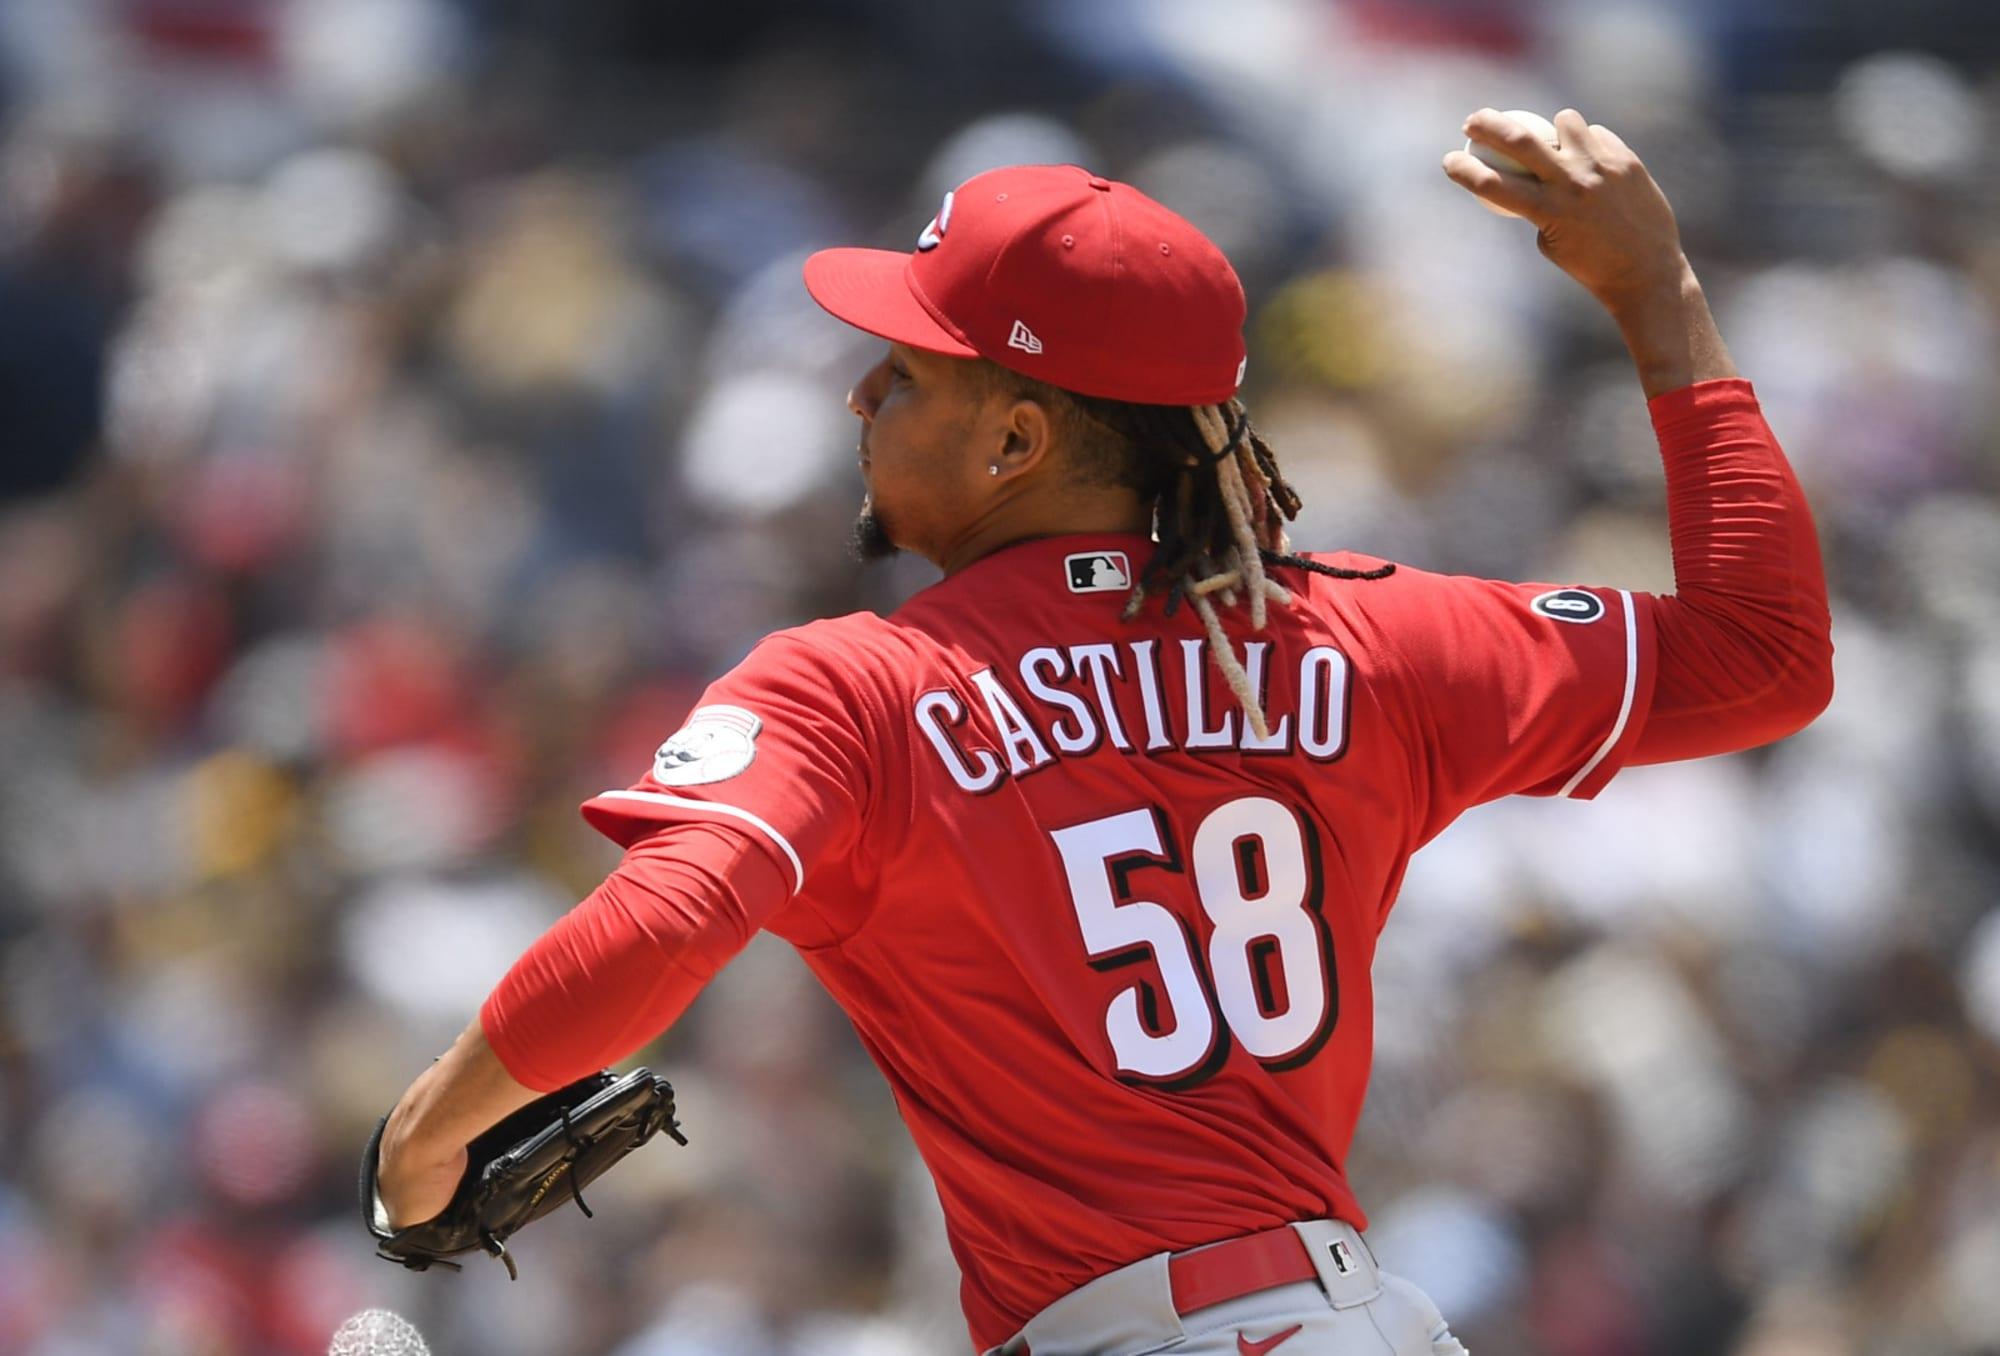 Reds: Umpires' pathetic strike zone cost Luis Castillo a win